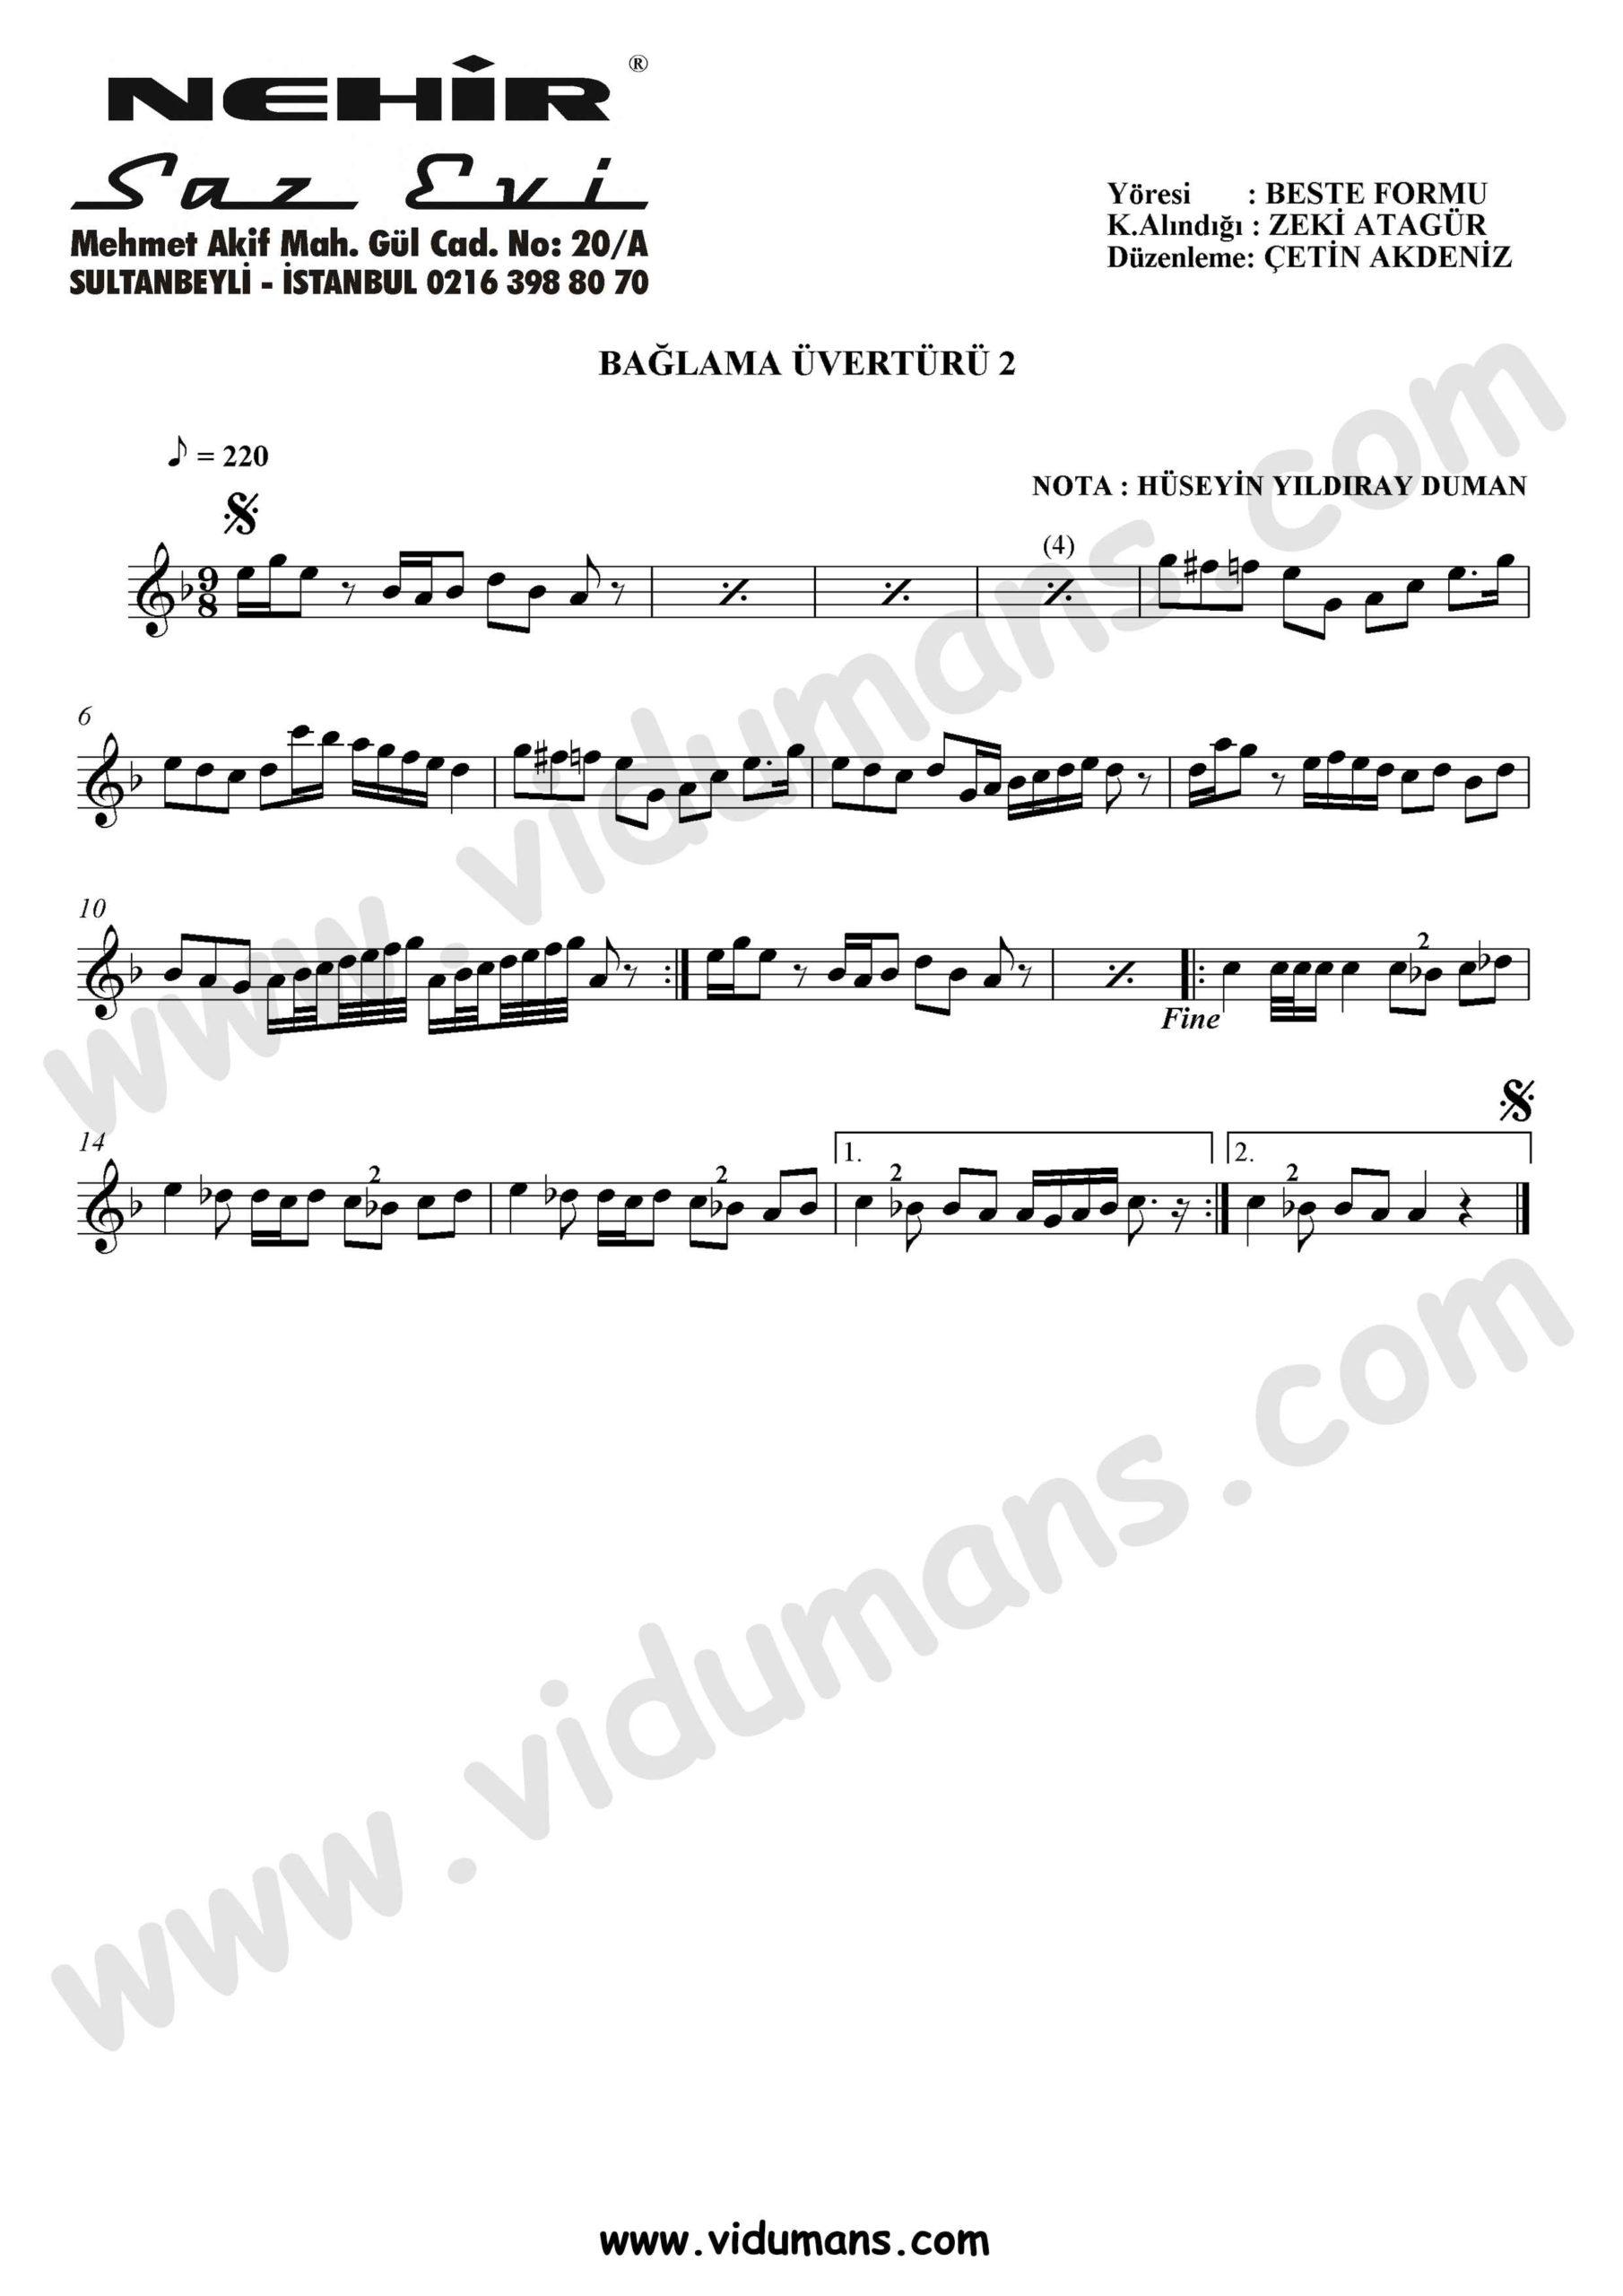 Baglama Uverturu 2-Baglama-Saz-Notalari